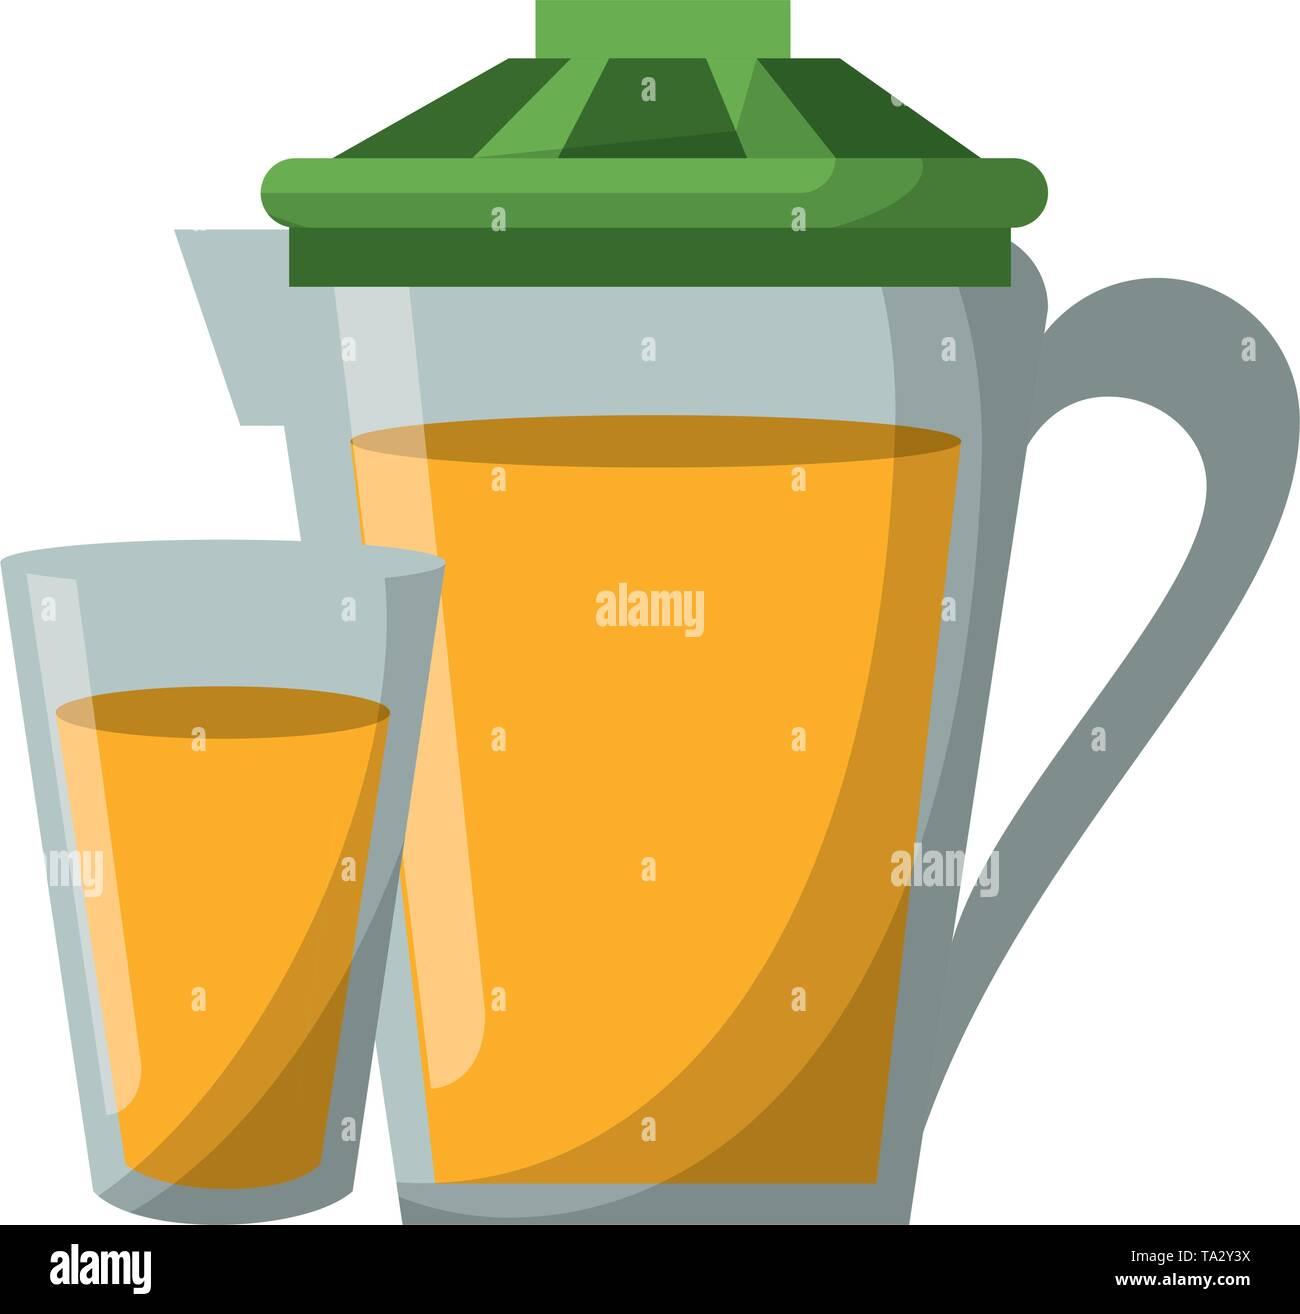 Orange juice cup and jar cartoon Vector illustration - Stock Image